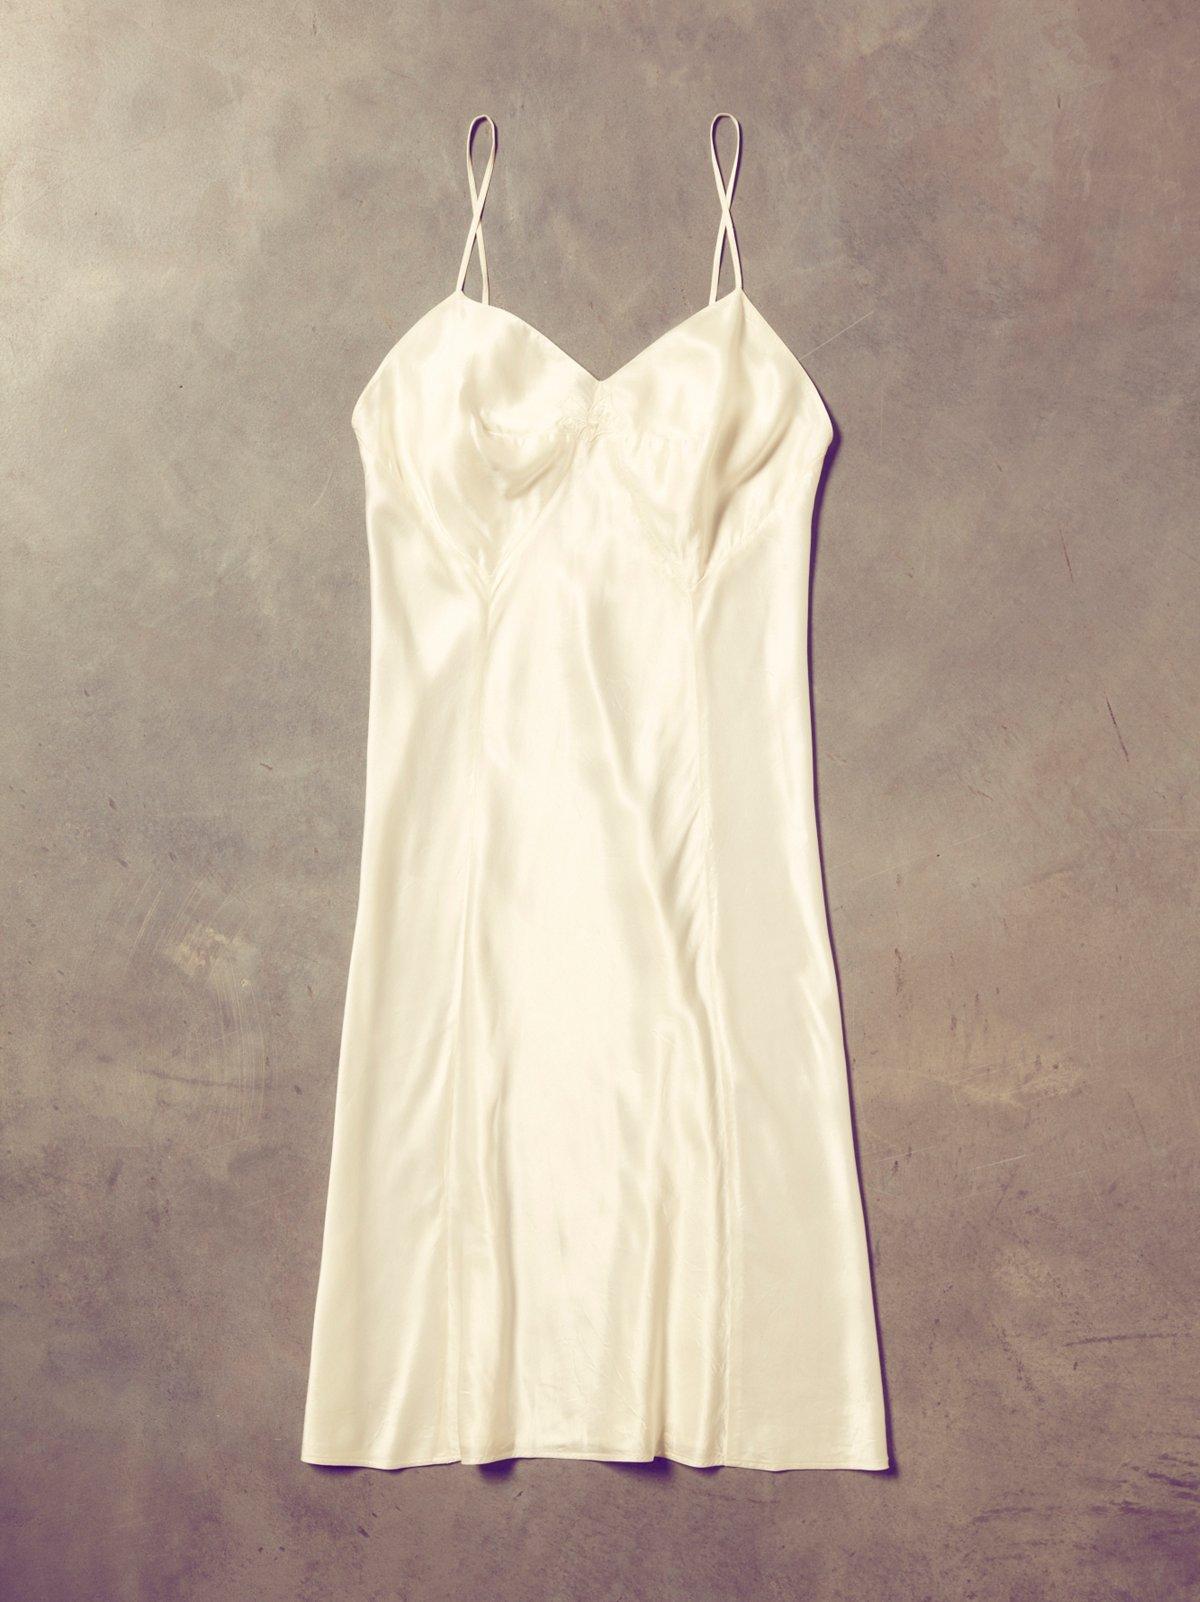 Vintage 1960s Slip Dress